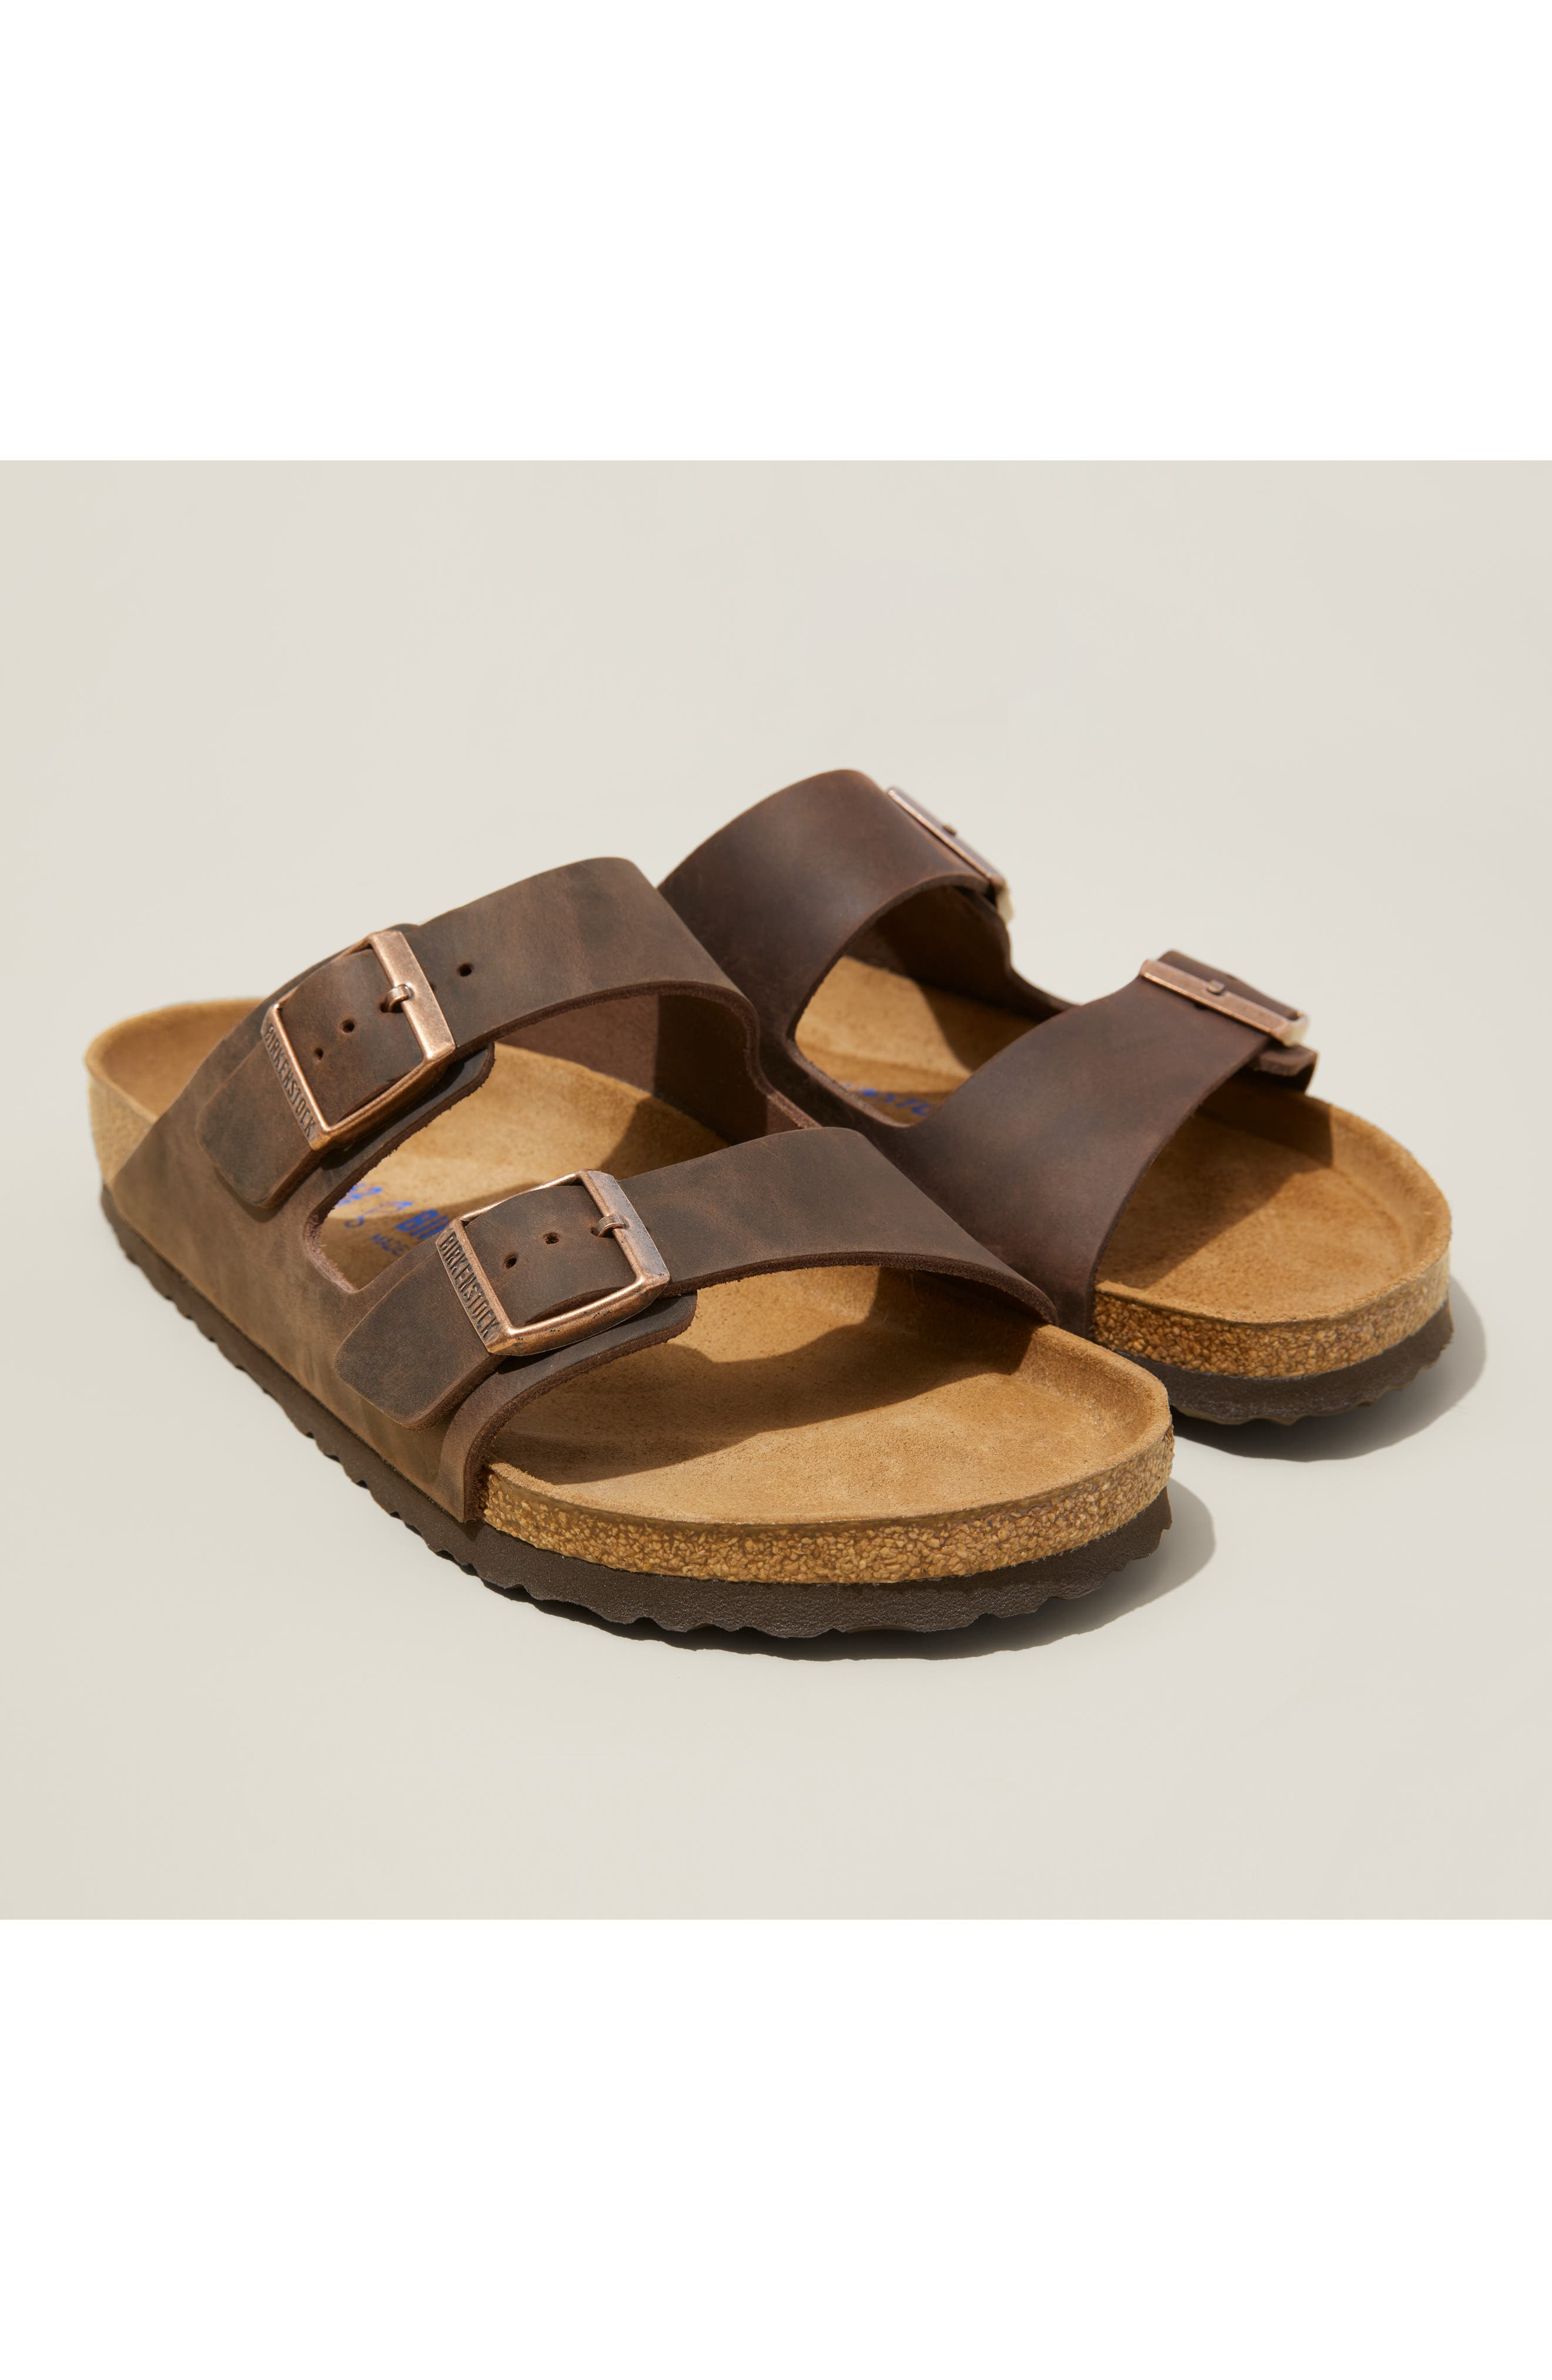 Birkenstock Arizona Soft Slide Sandal,10.5 - Blue